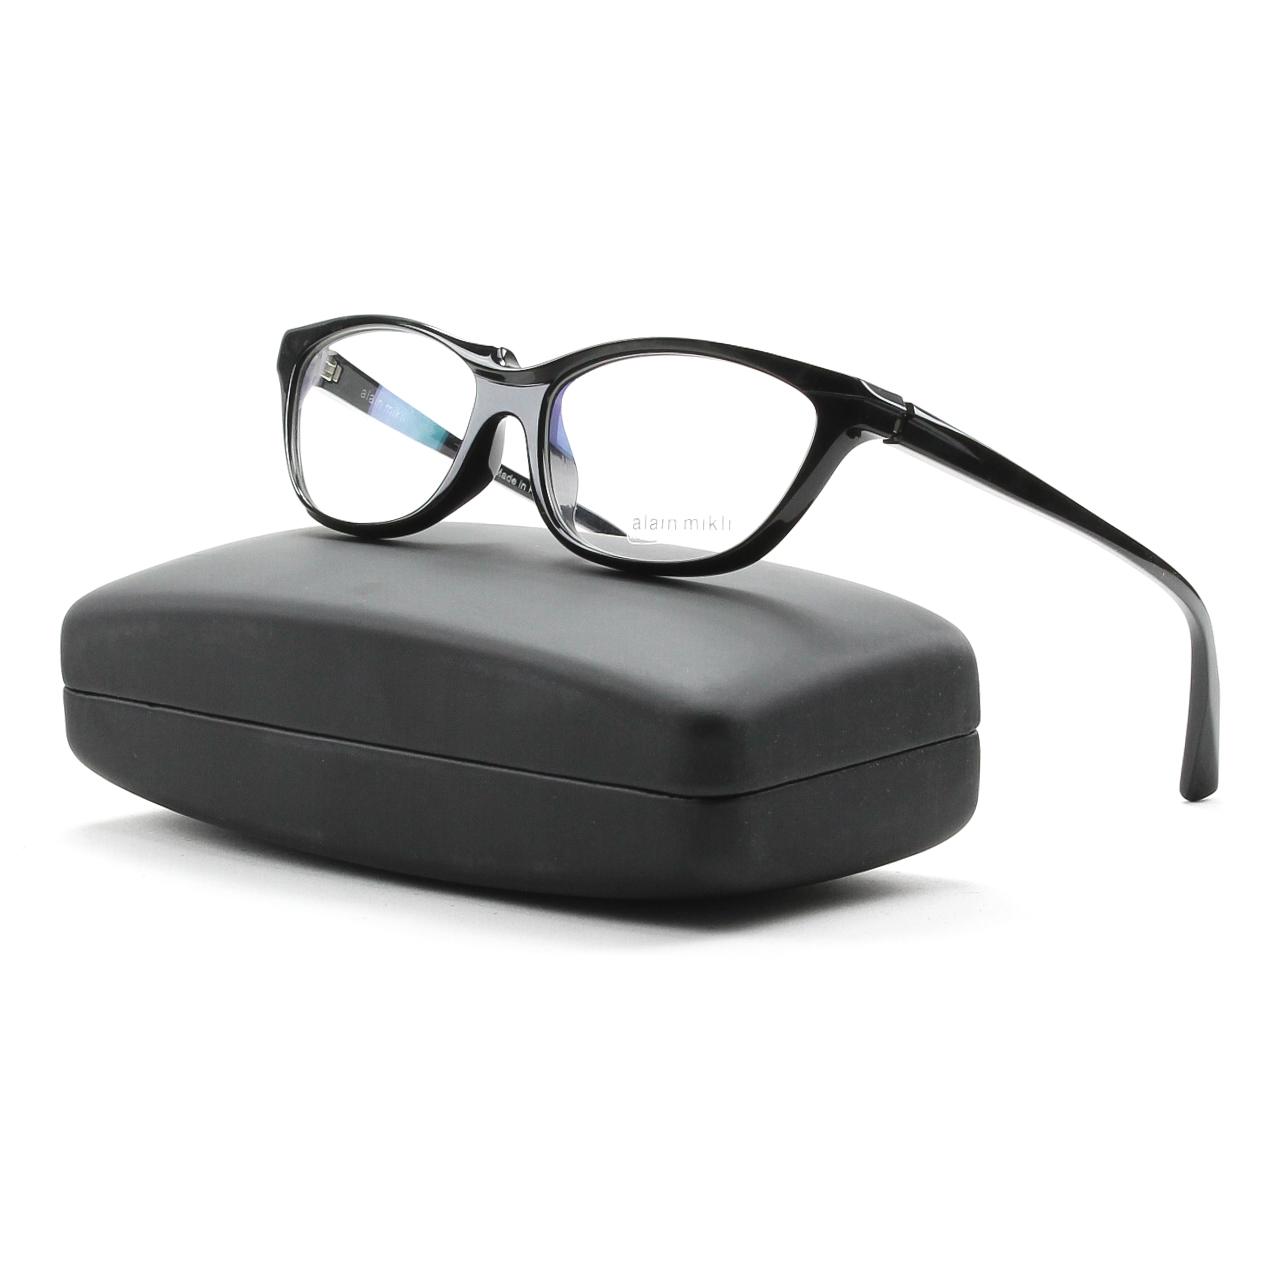 1bdc6a885b Alain Mikli AL0882 Eyeglasses 03 Black Frame   RX Clear Demo Prescription  Lenses